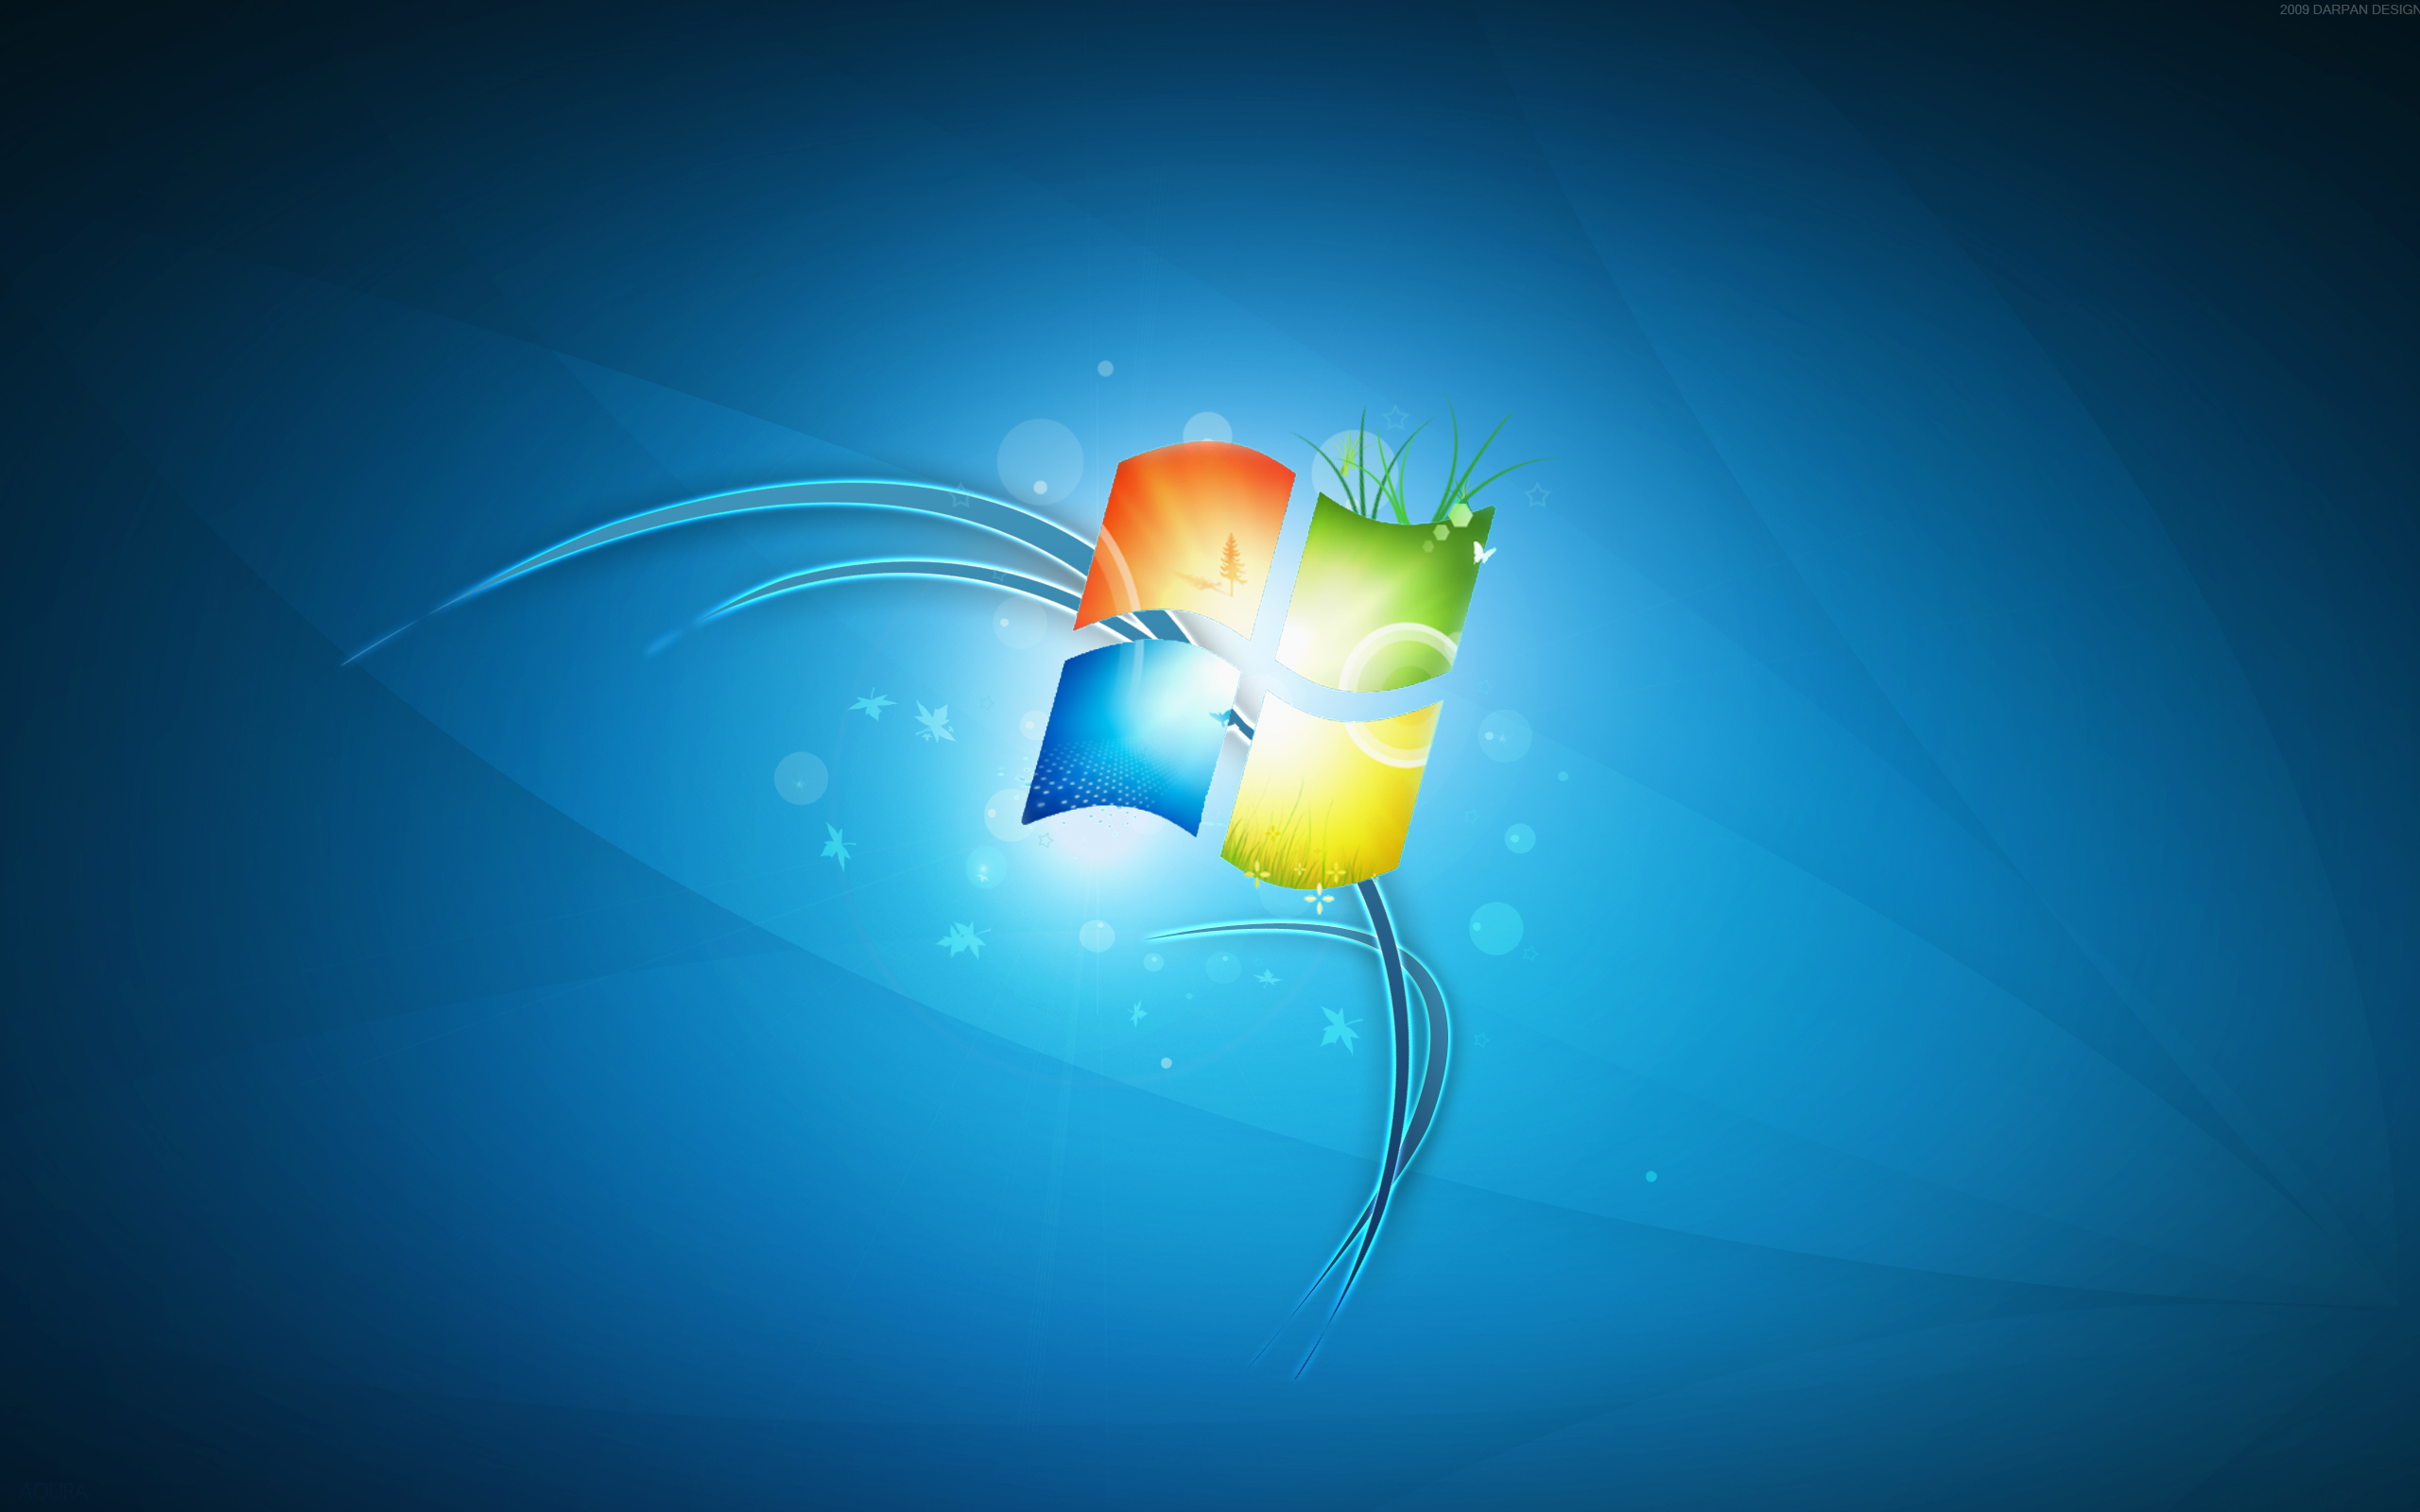 Hd wallpaper windows 7 - Windows 7 Hd Wallpapers